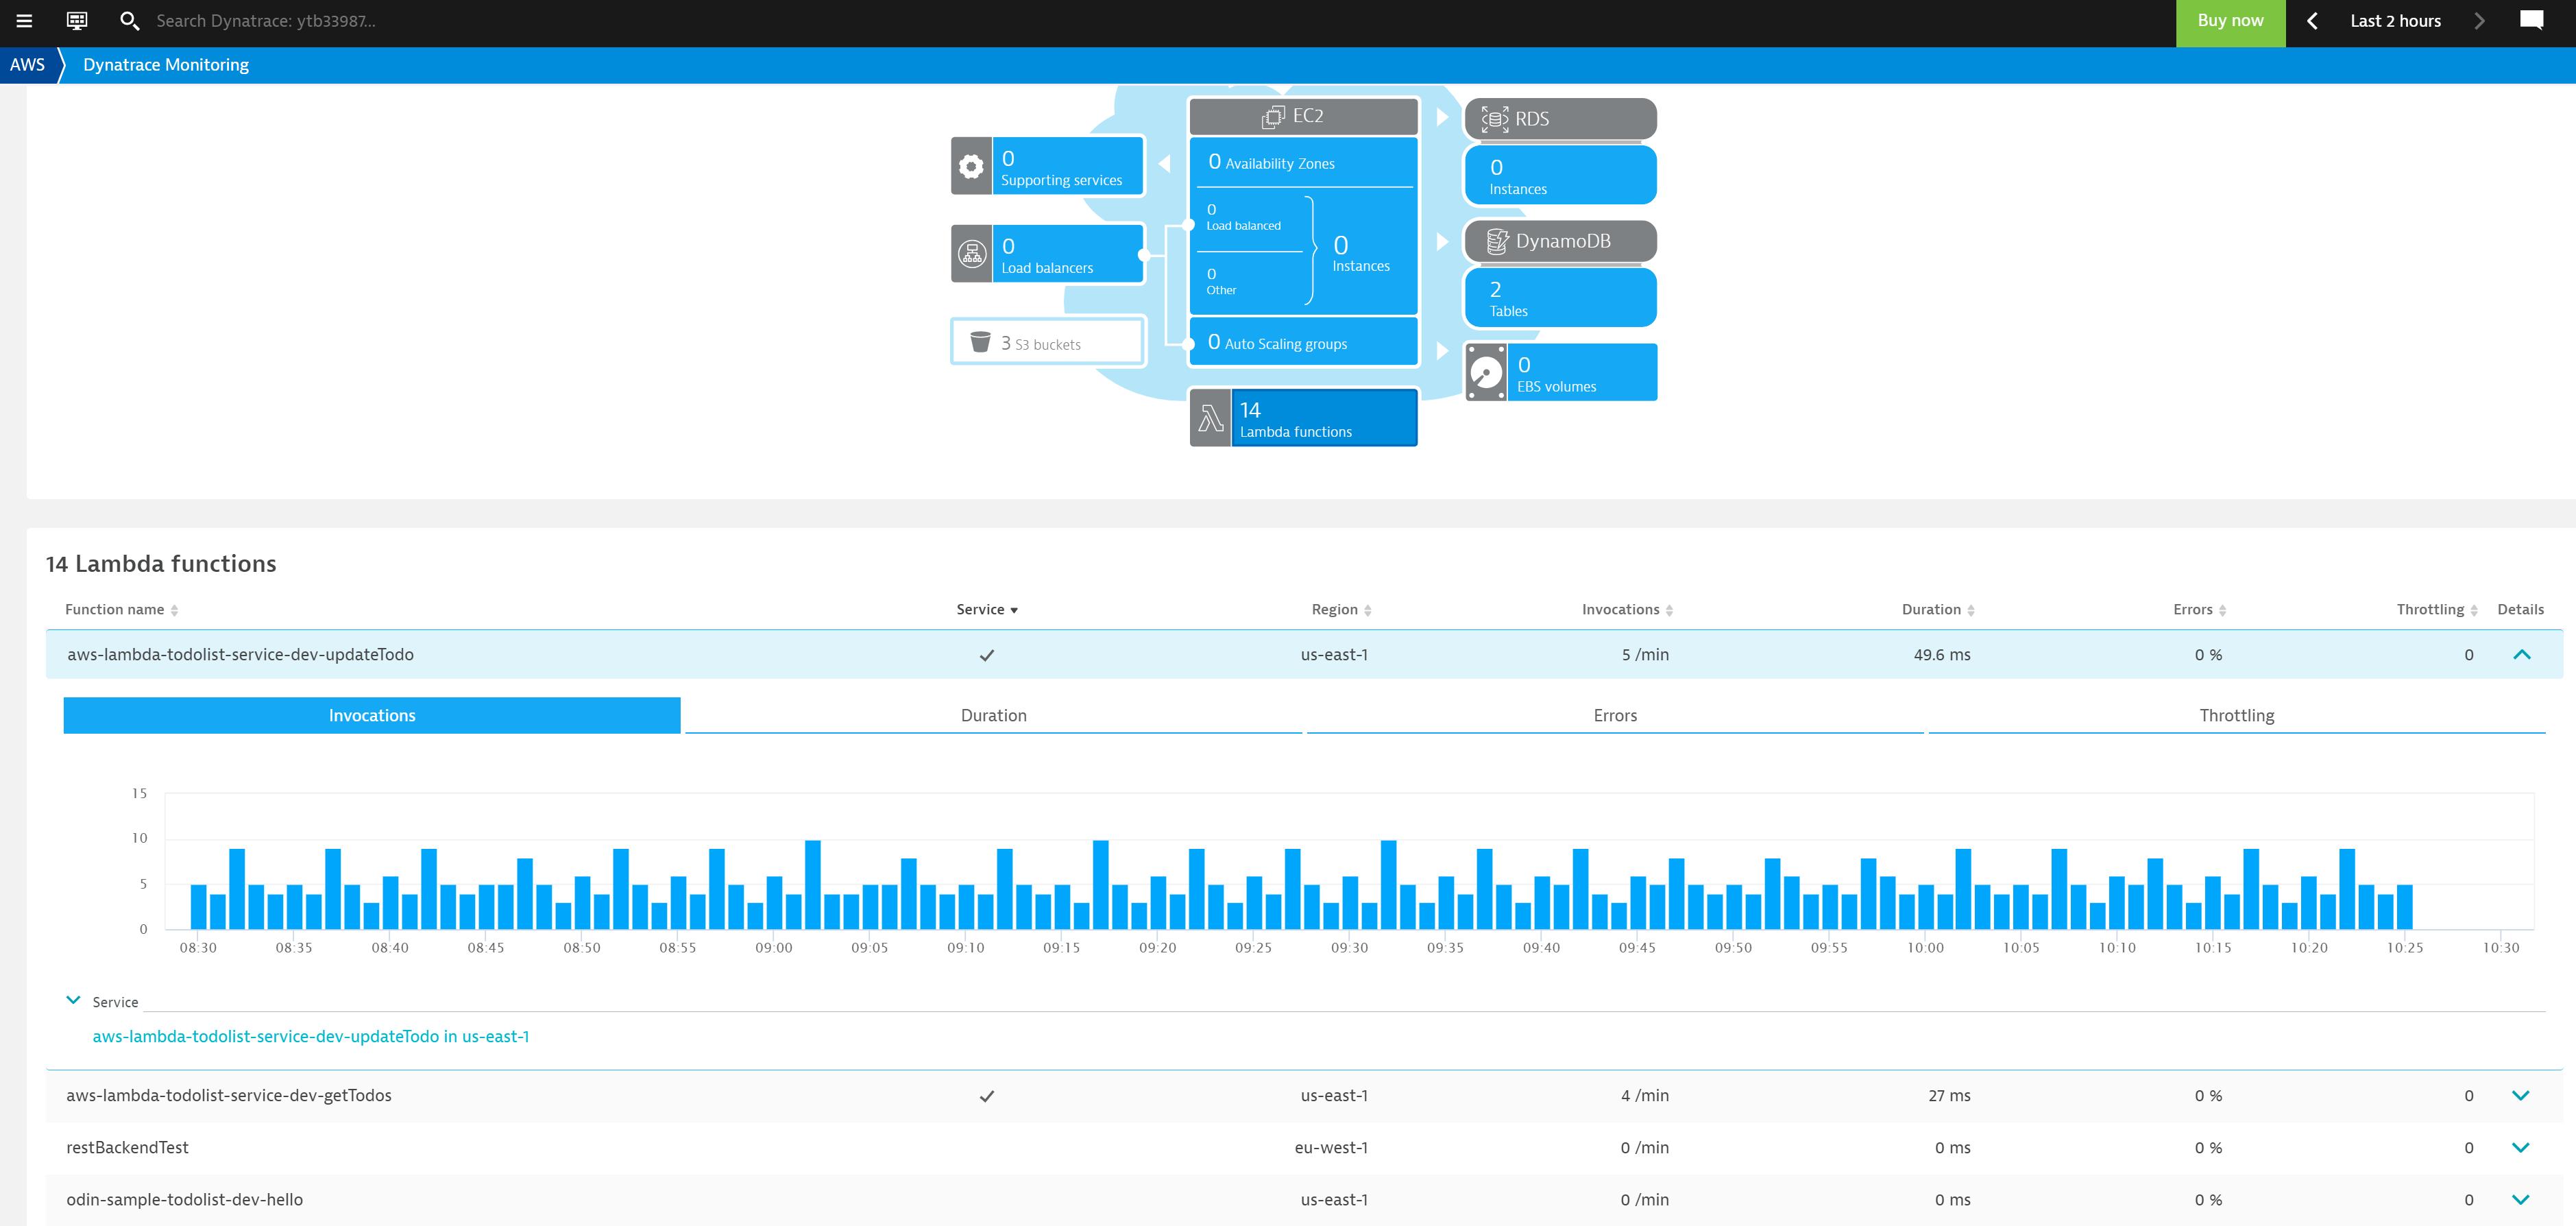 AWS dashboard showing CloudWatch metrics for the 14 monitored Lambda functions